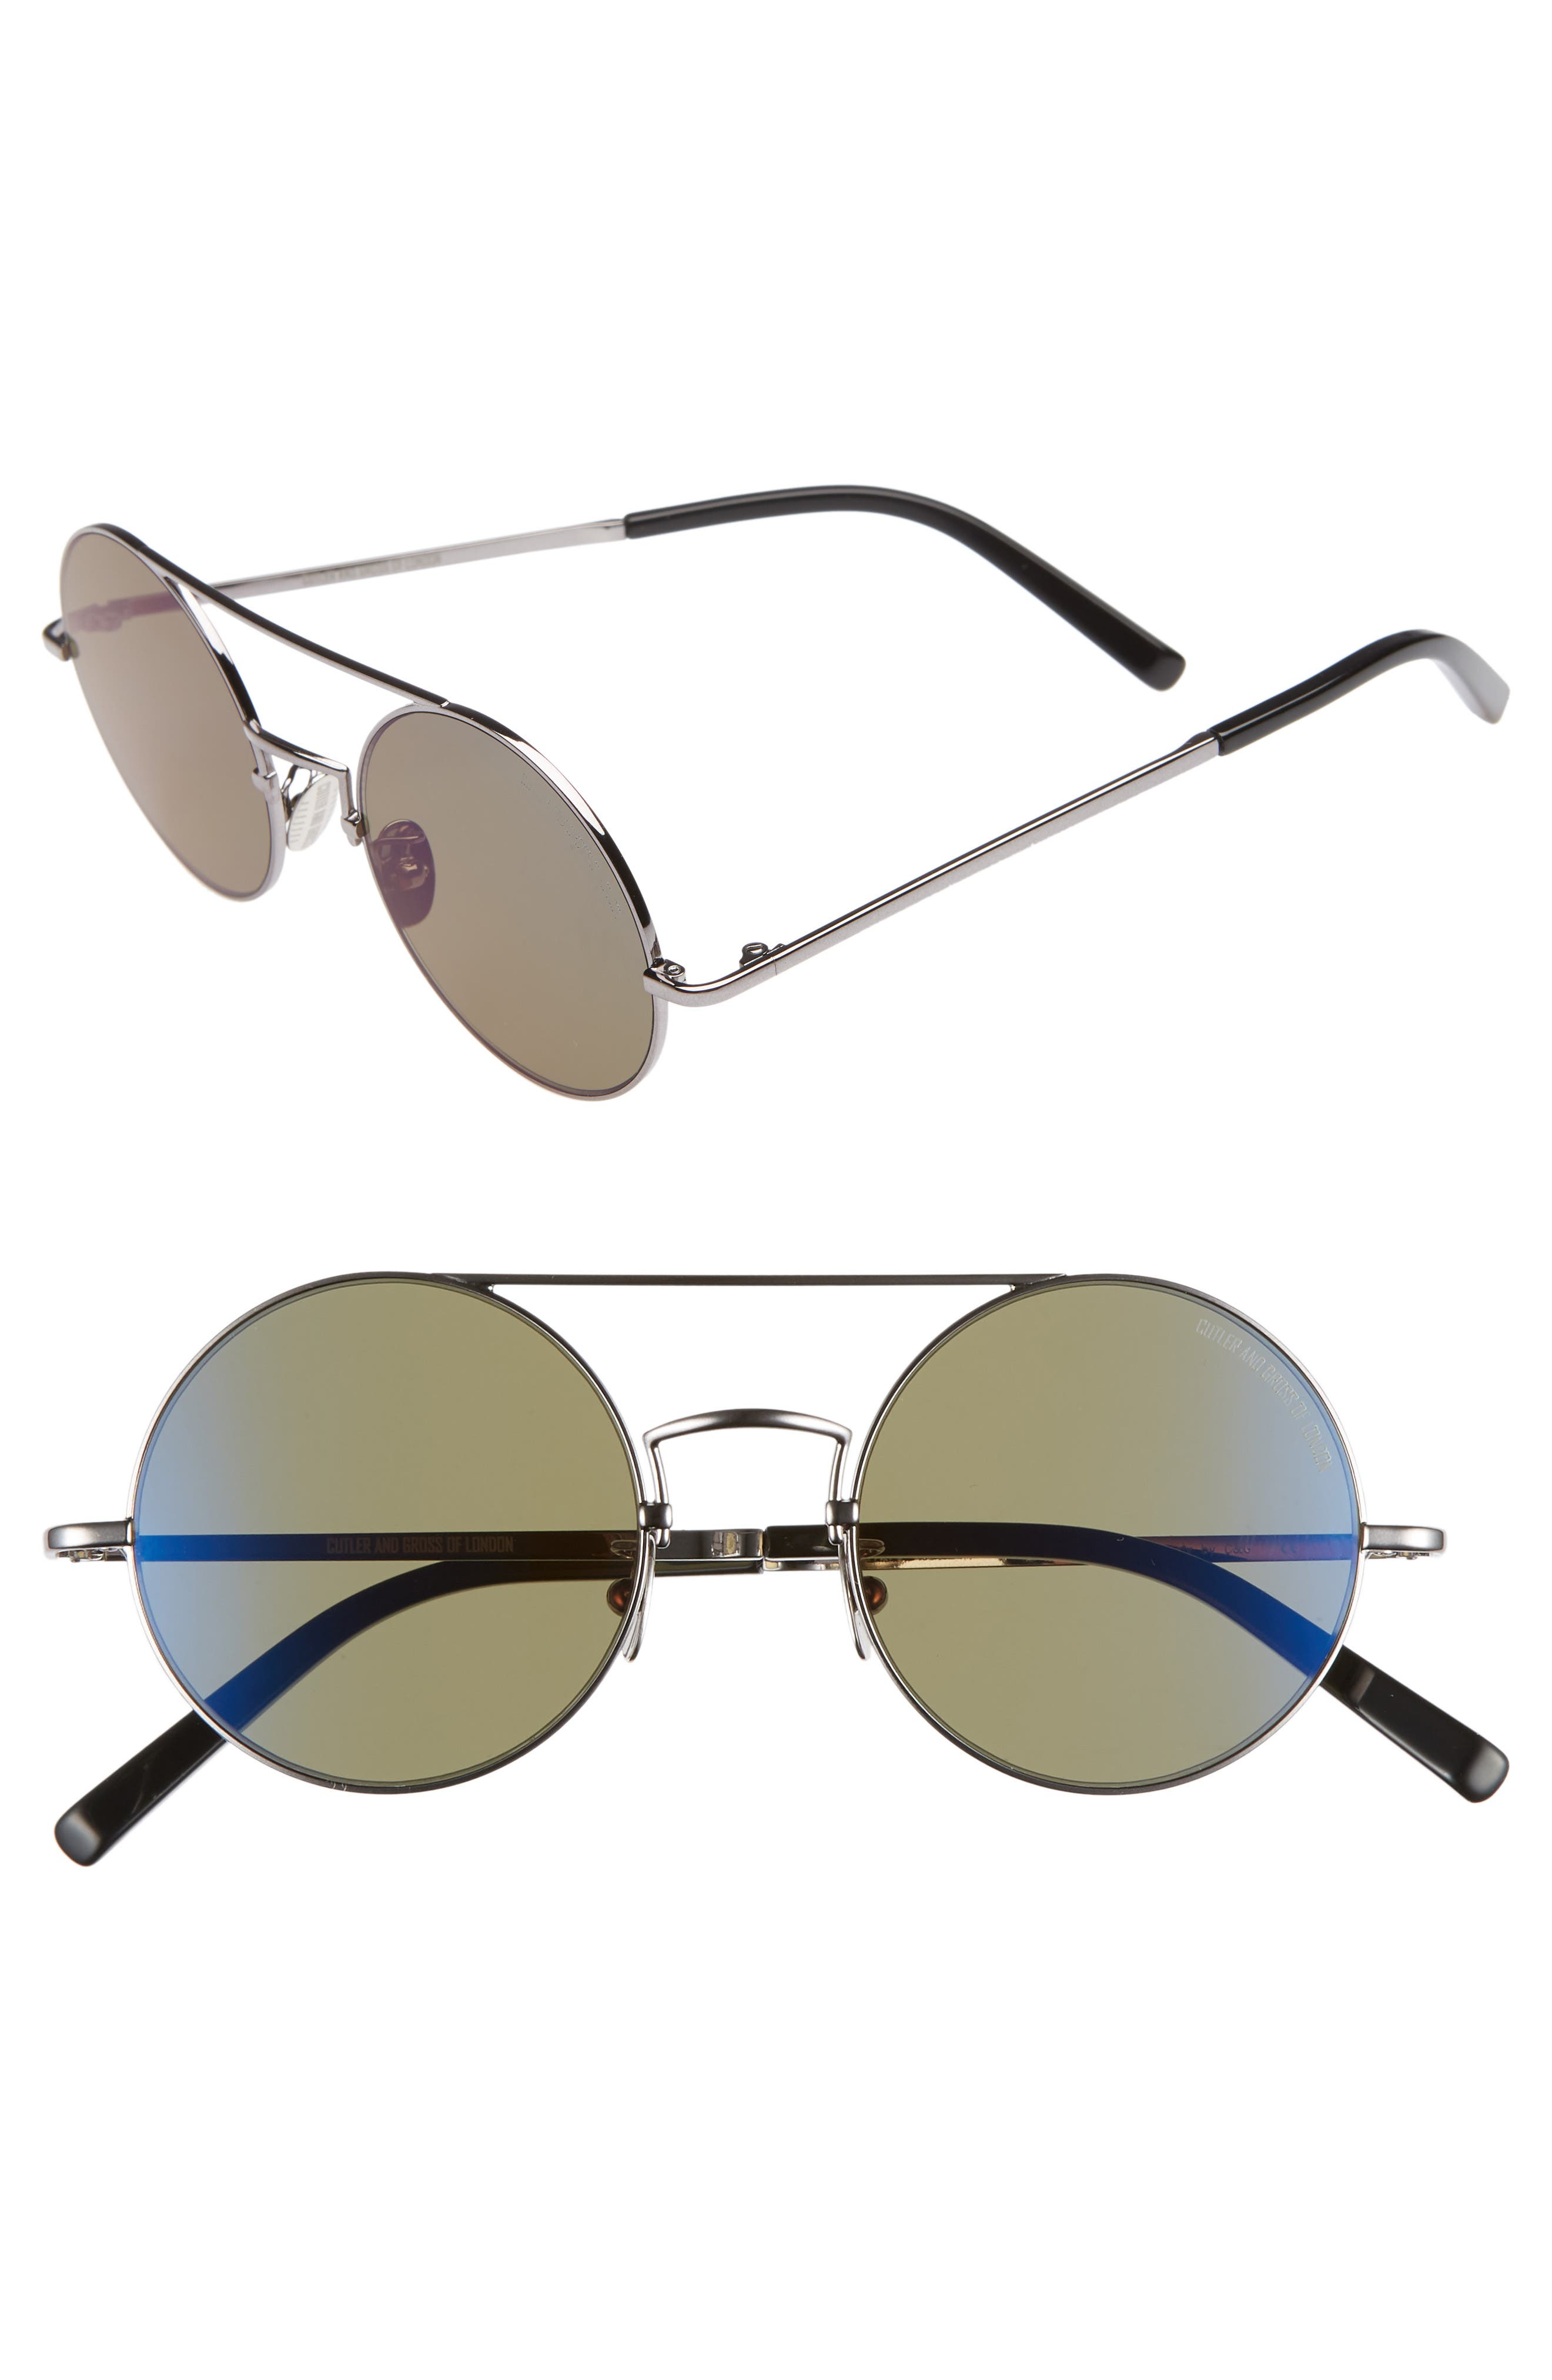 CUTLER AND GROSS, 49mm Polarized Round Sunglasses, Main thumbnail 1, color, RUTHENIUM METAL/ DARK GREEN